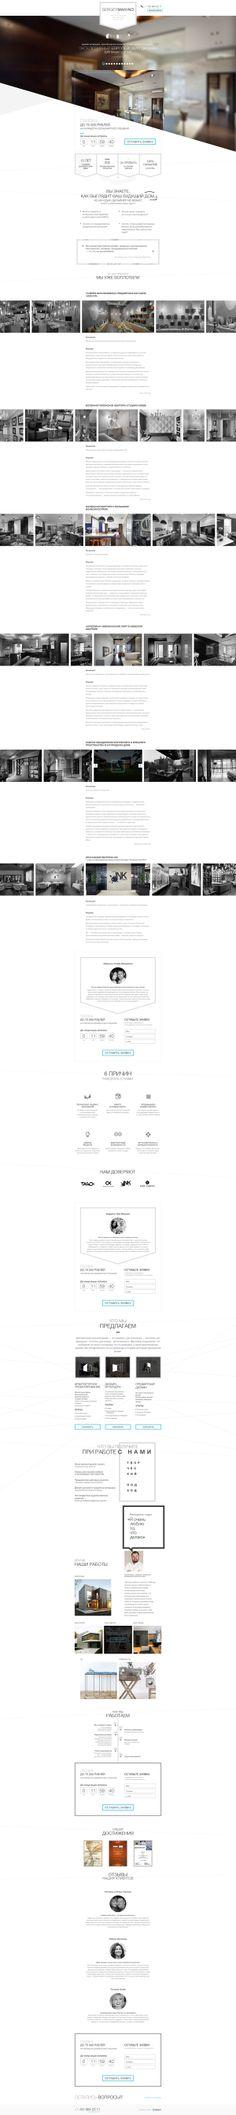 "Landing Page ""Sergey Makhno"" by Vyacheslav Gusev, via Behance"